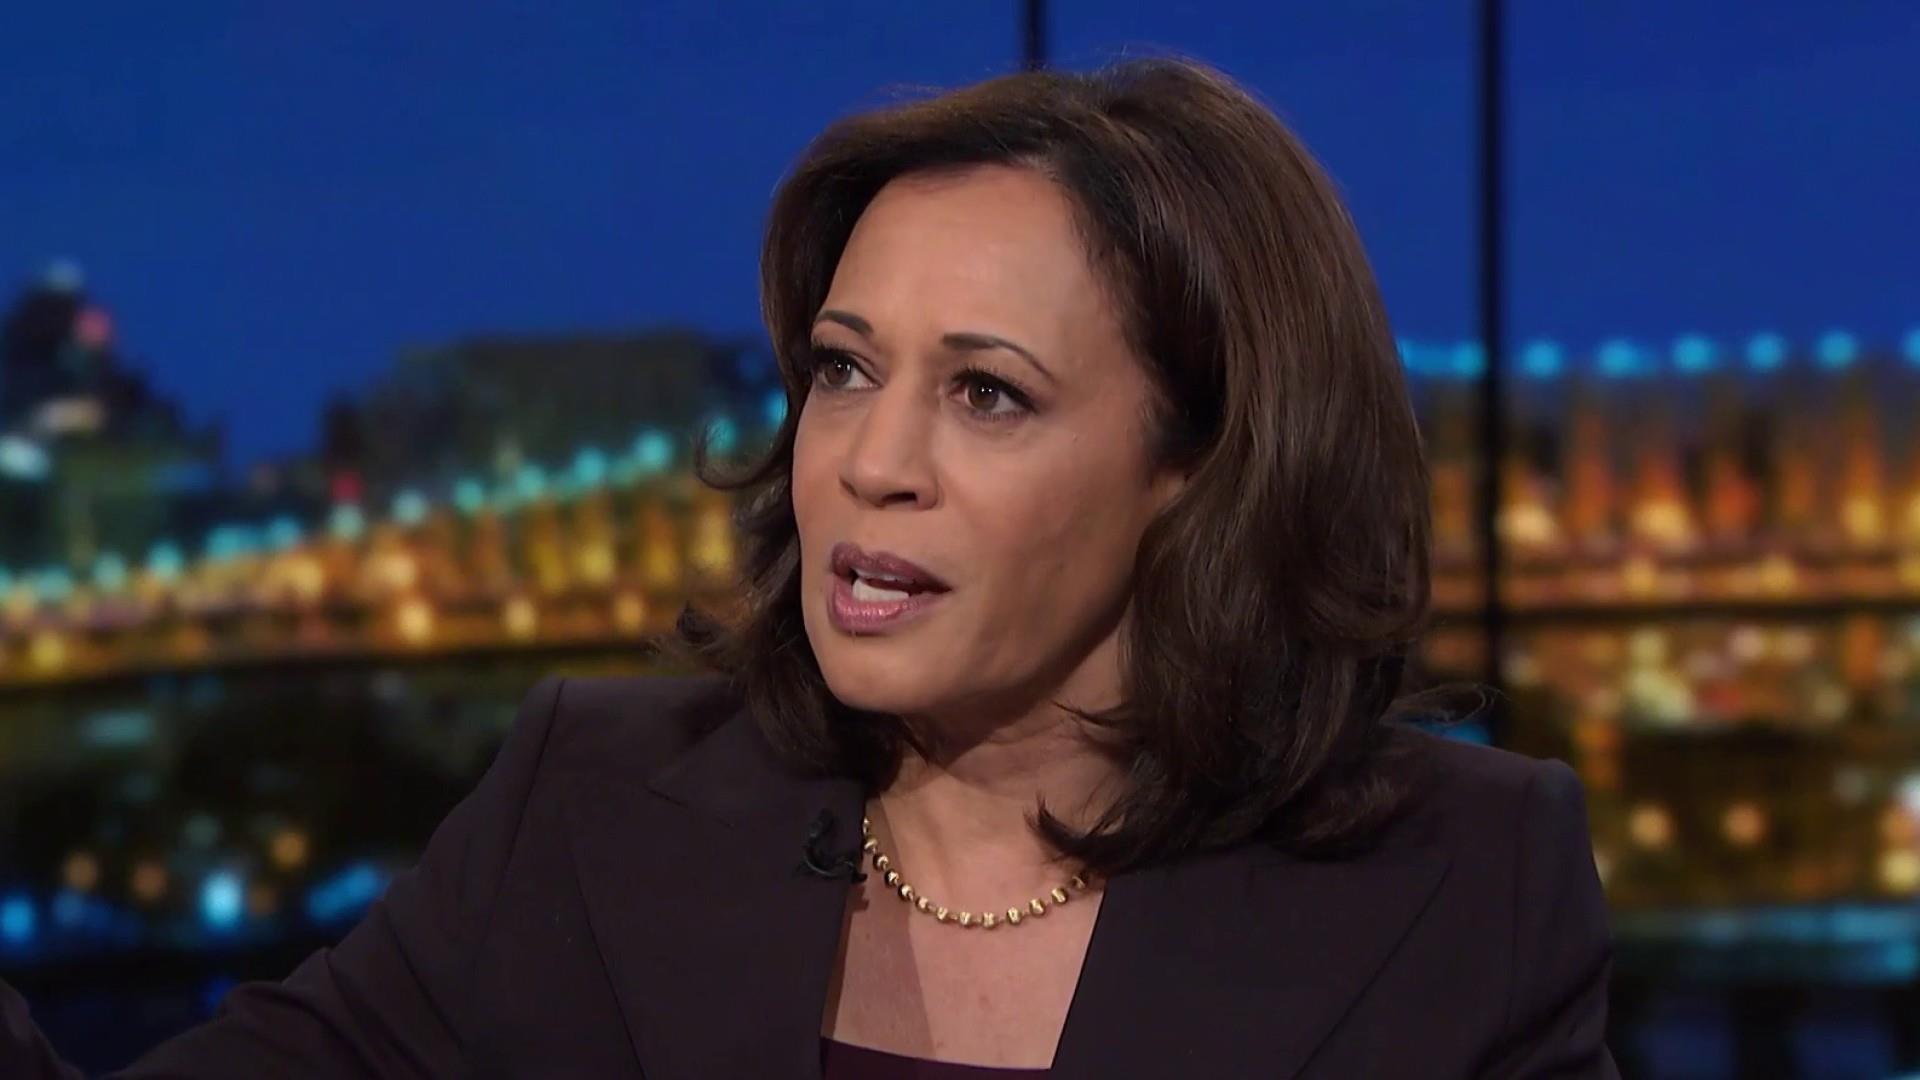 Harris: Trump White House choreographed 'sham' Kavanaugh hearing